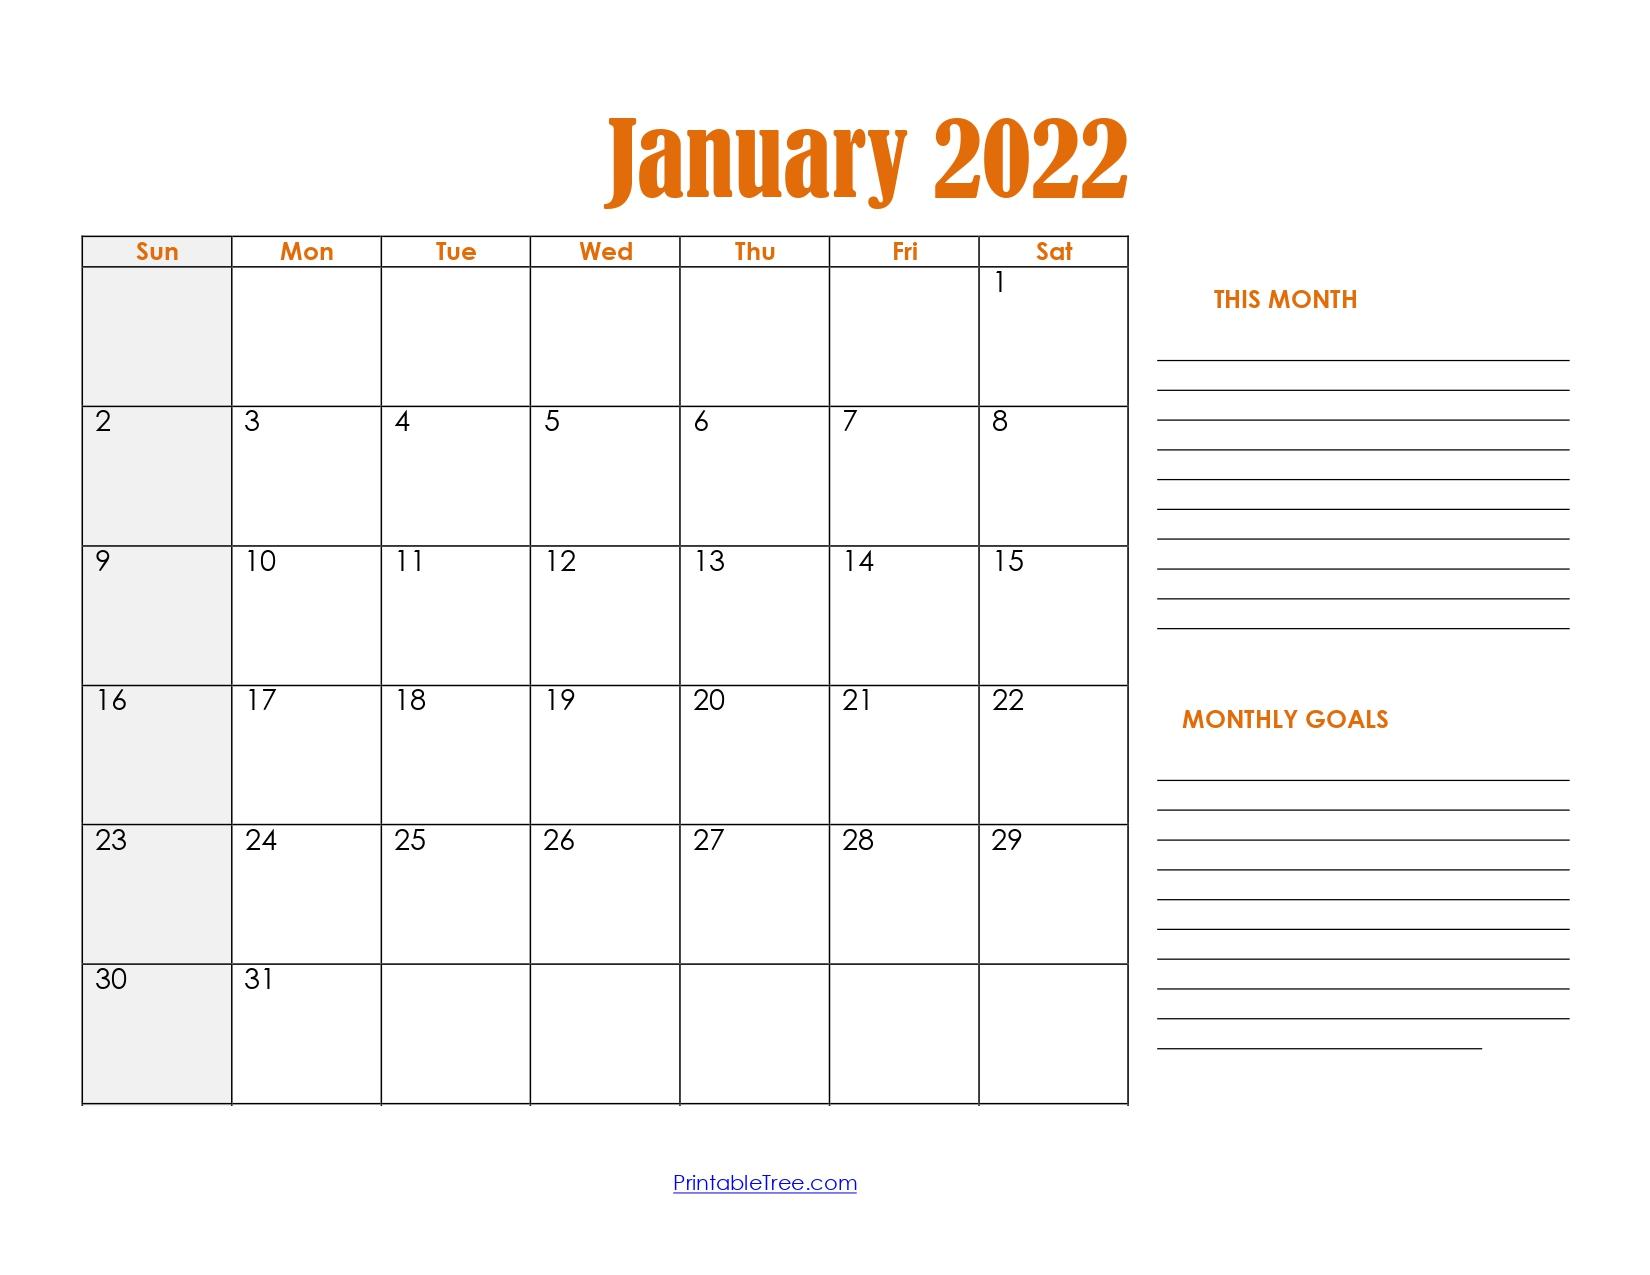 January 2022 Calendar with Goals